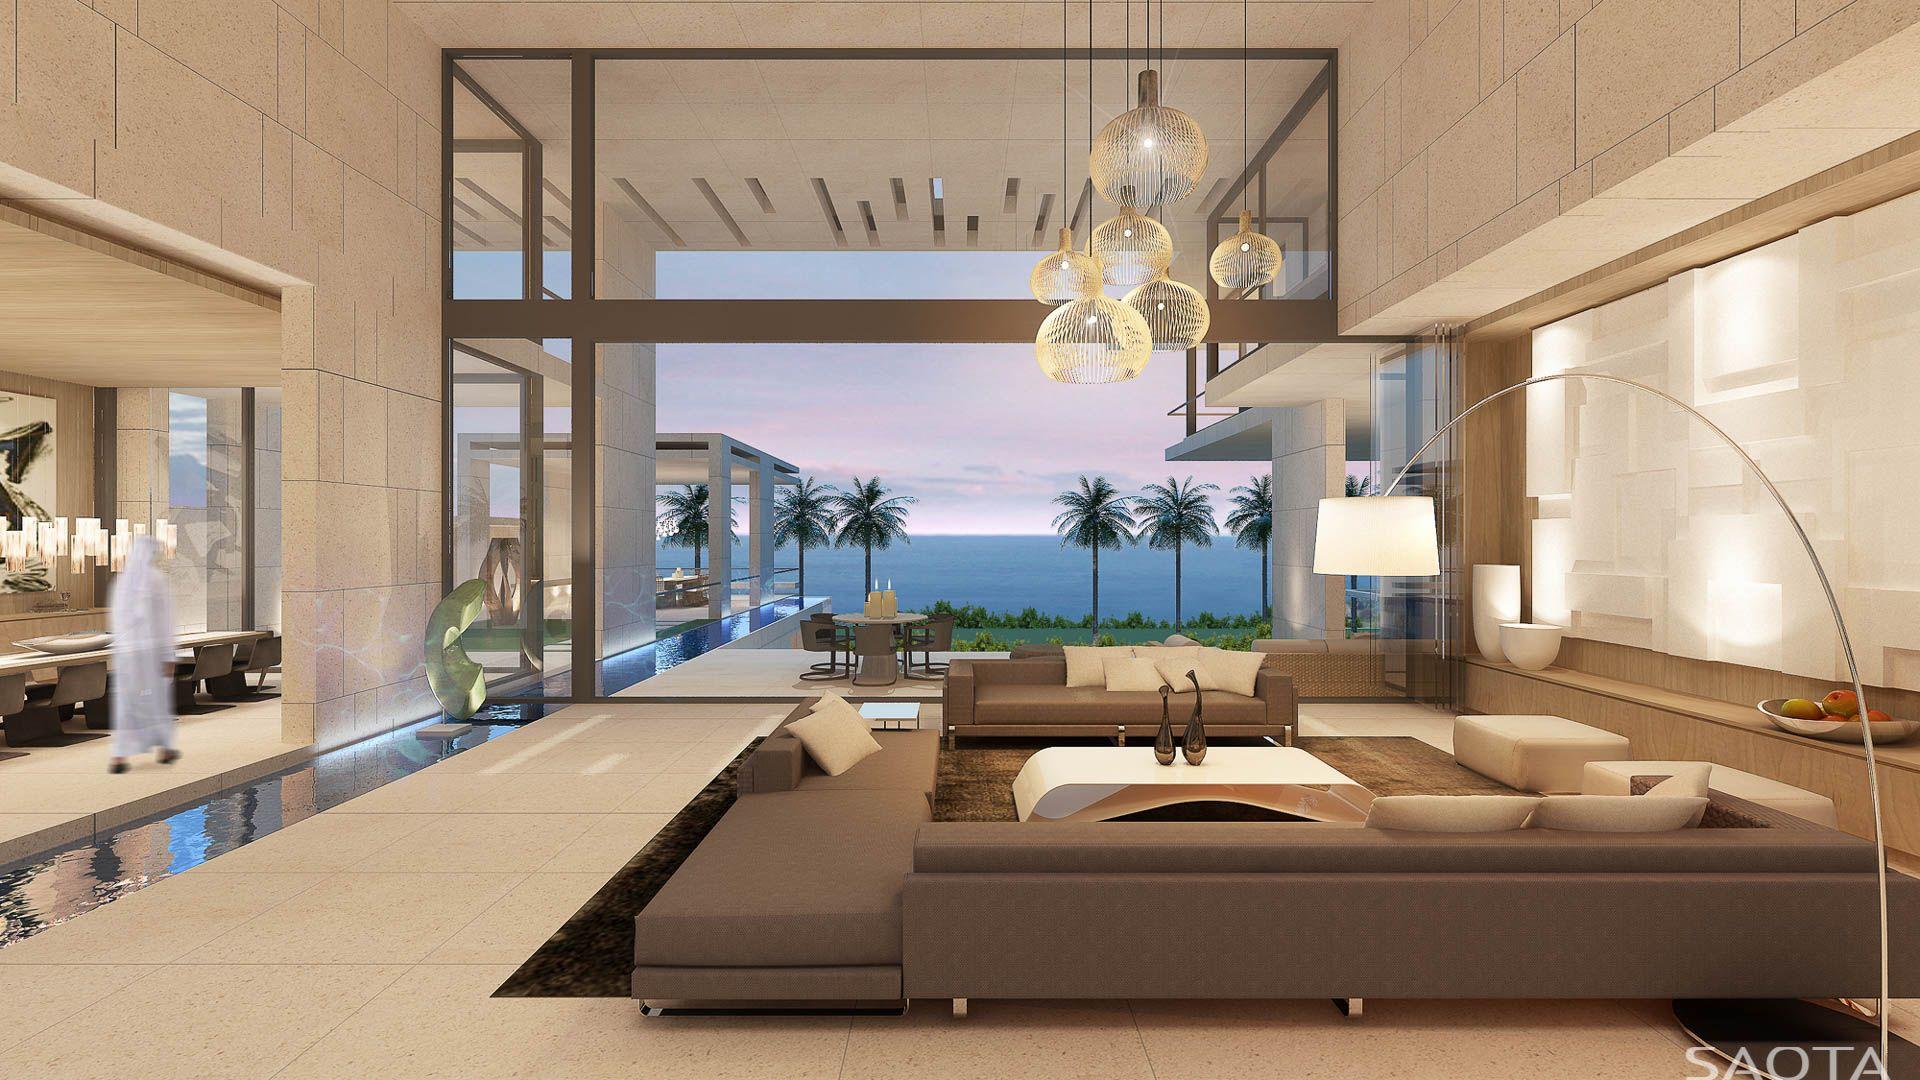 Modern Dream House Interior Design Ideas with Beautiful ... on Dream Home Interior  id=14155